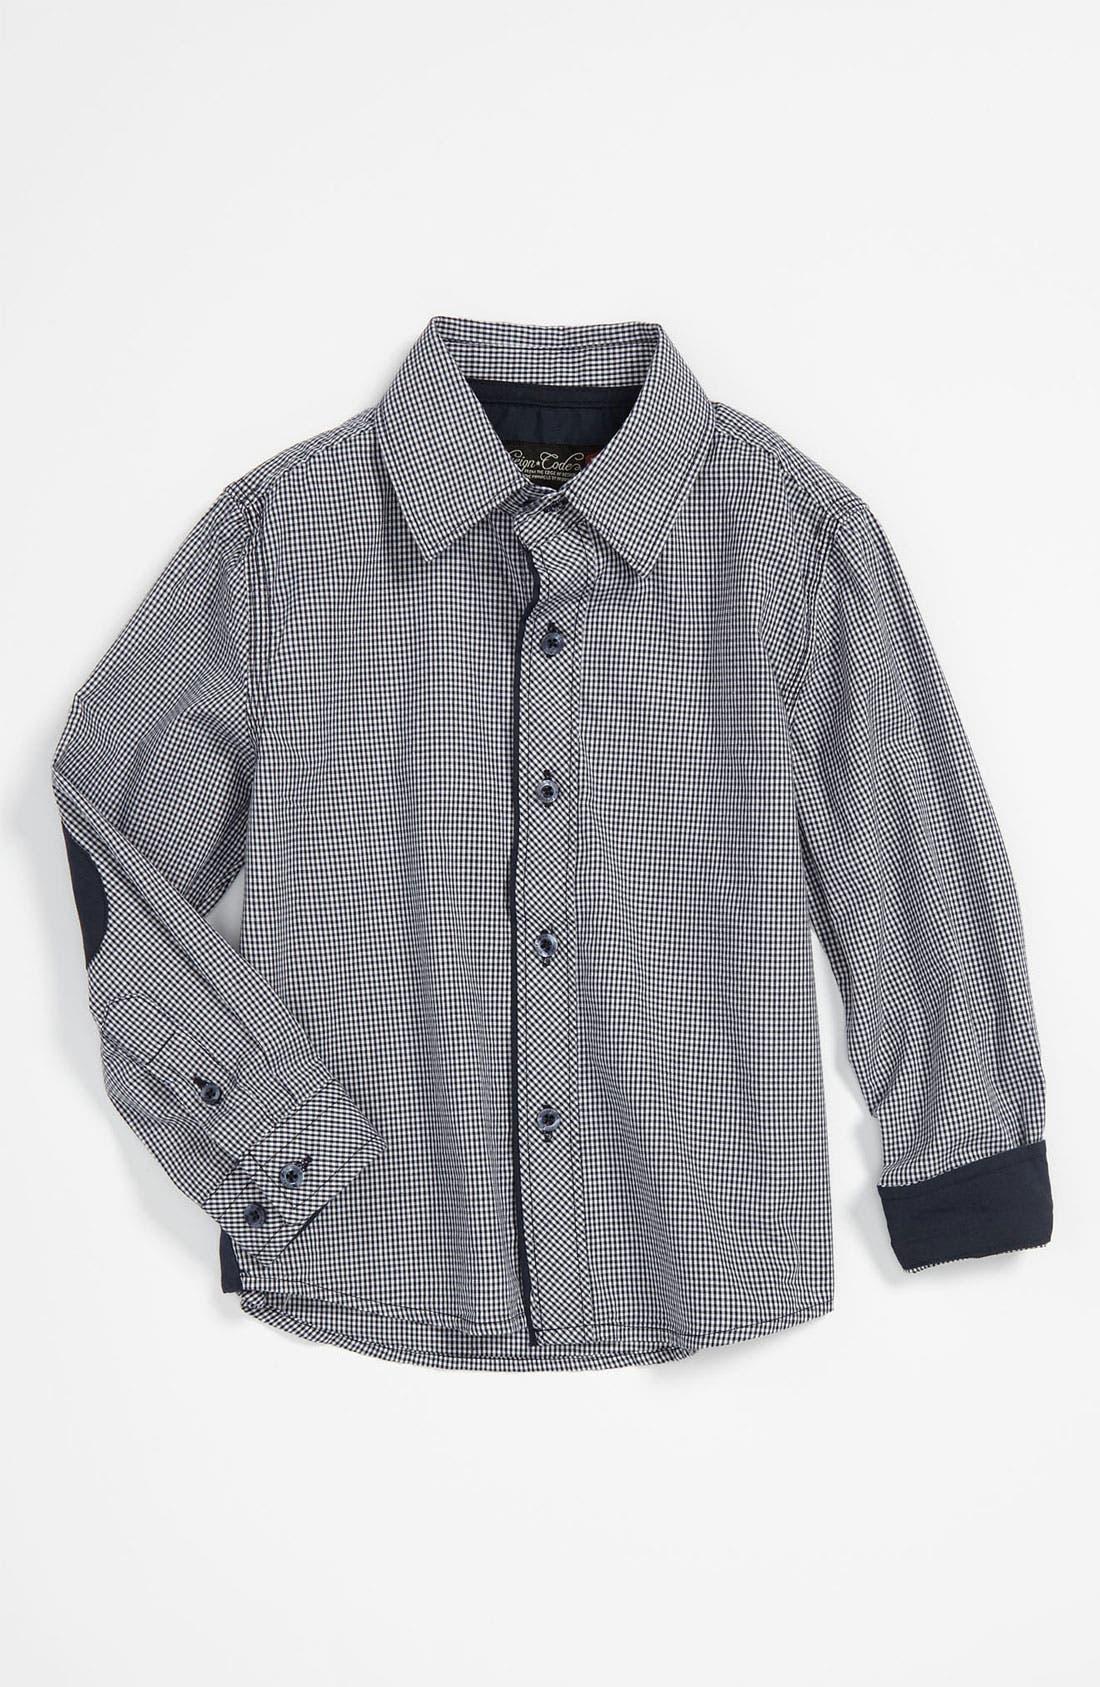 Alternate Image 1 Selected - Sovereign Code Gingham Shirt (Infant)